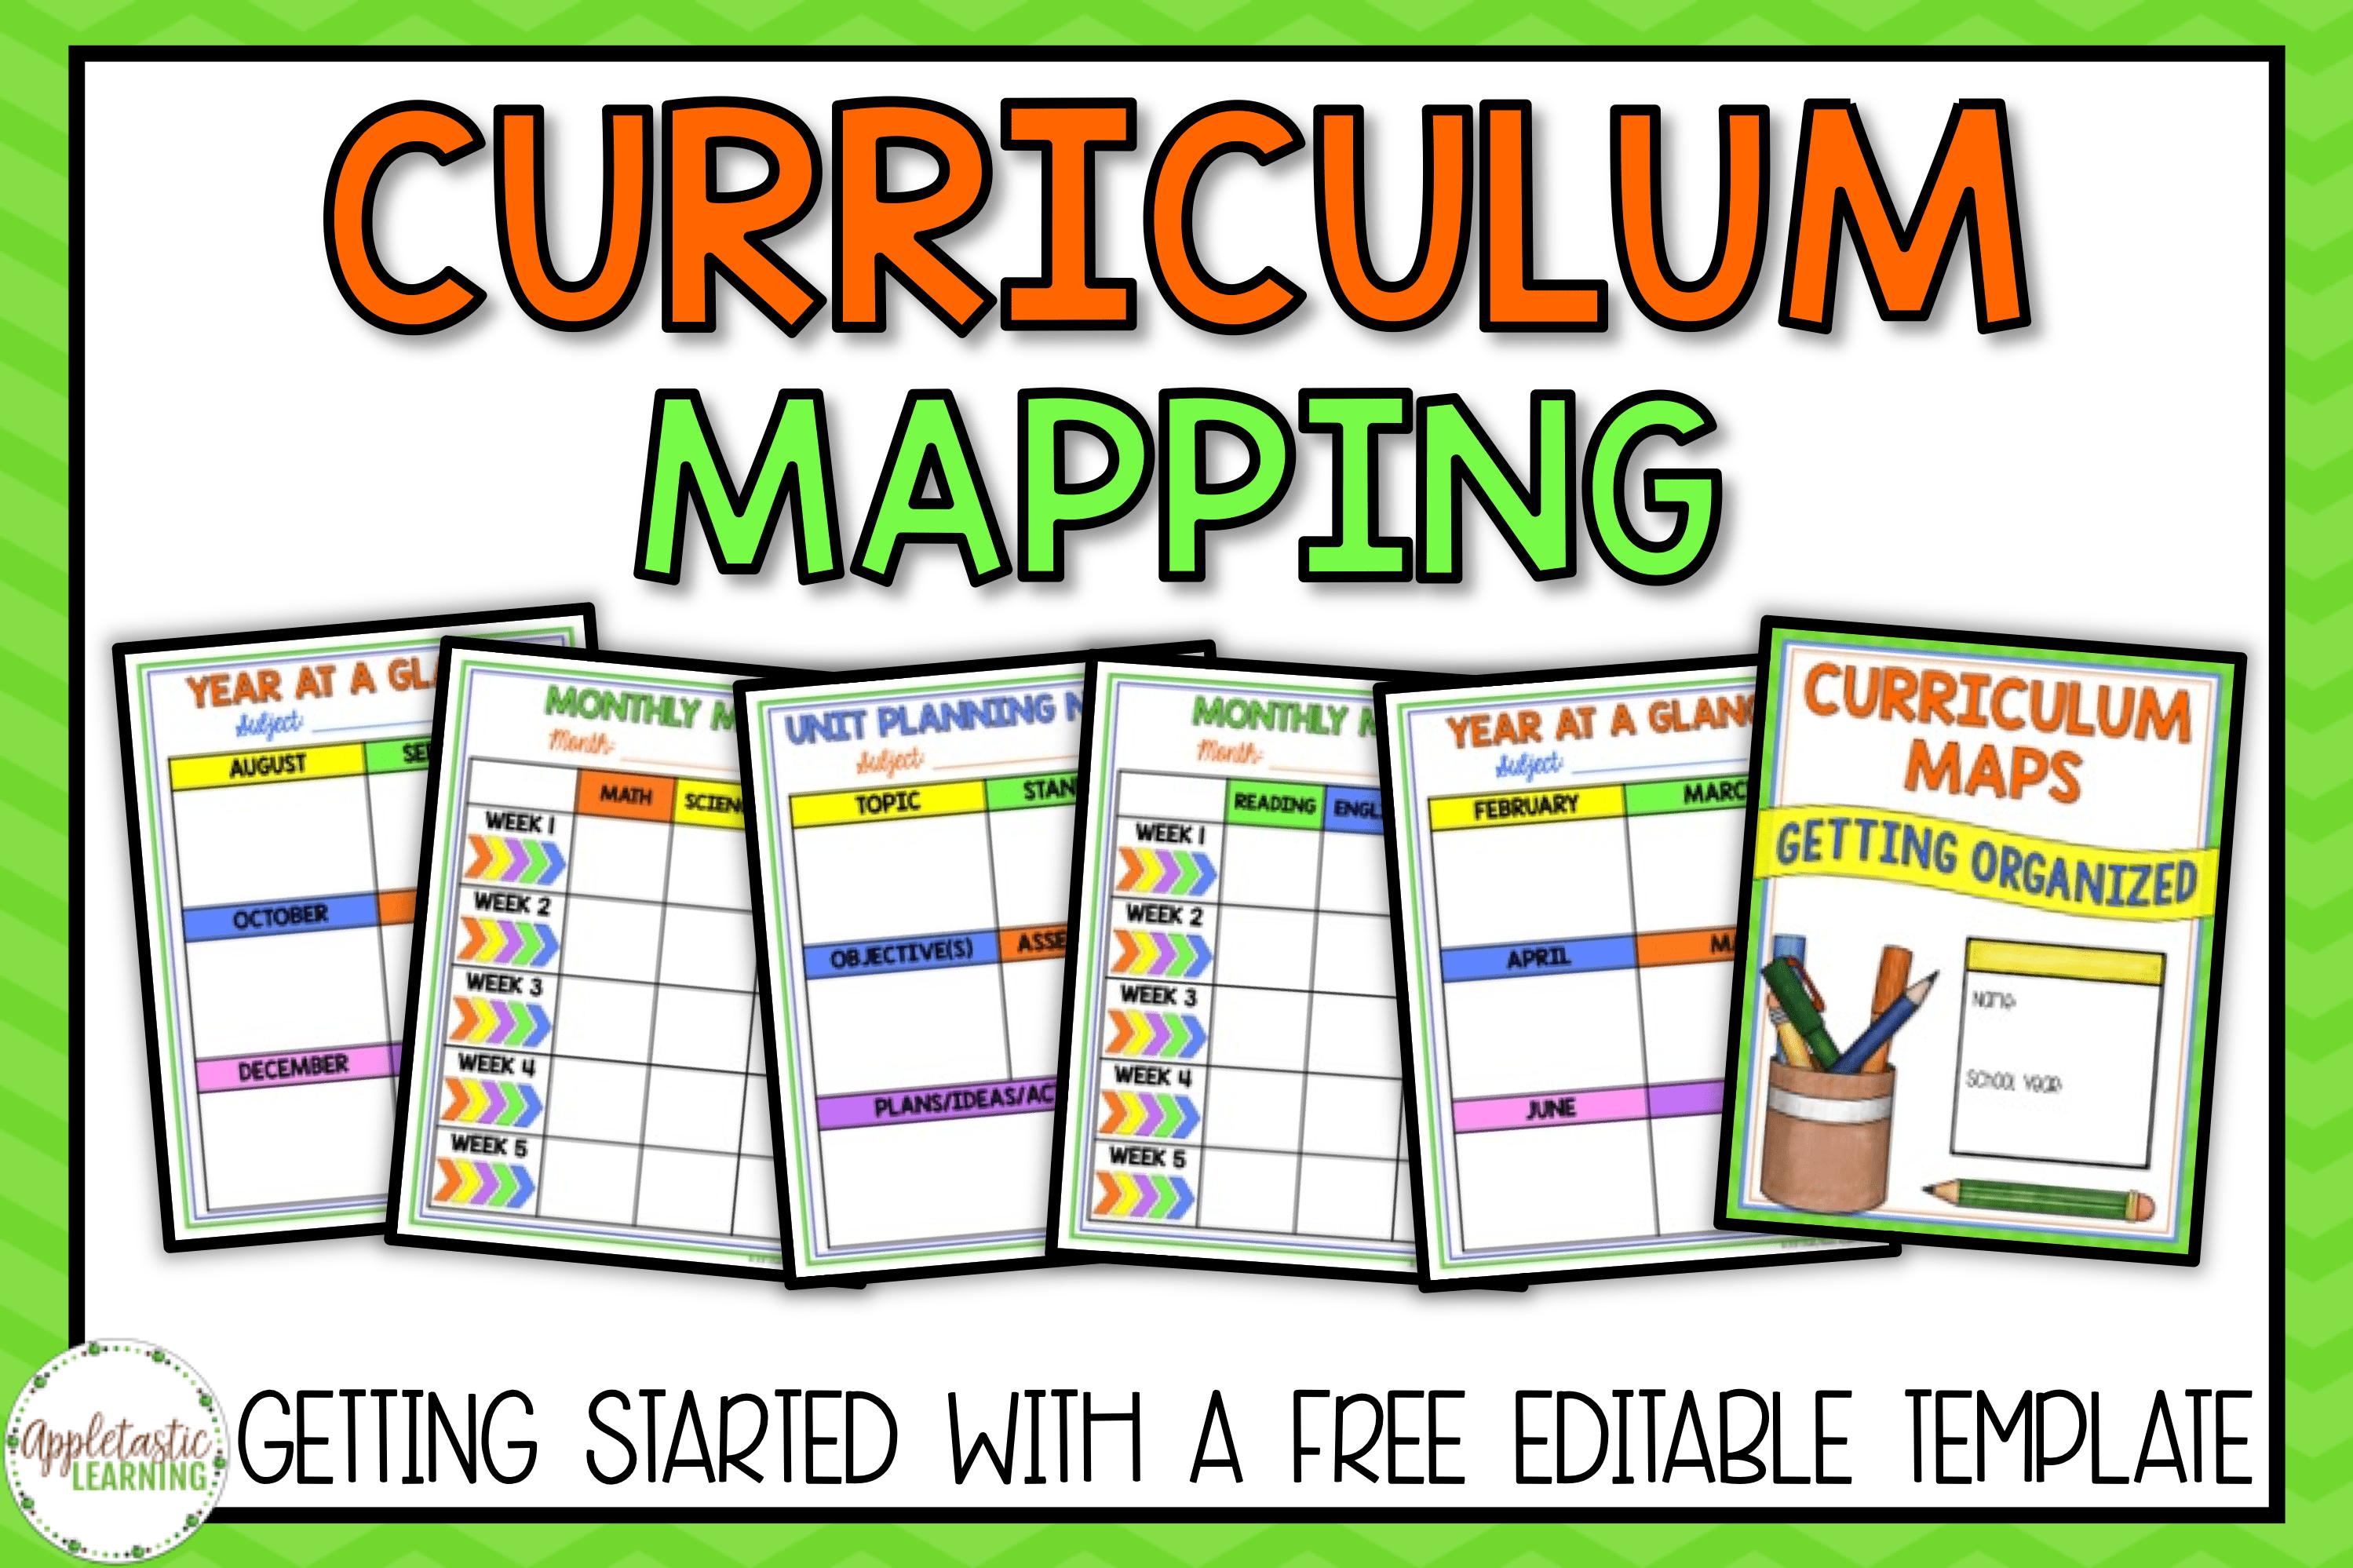 textbook clipart curriculum map